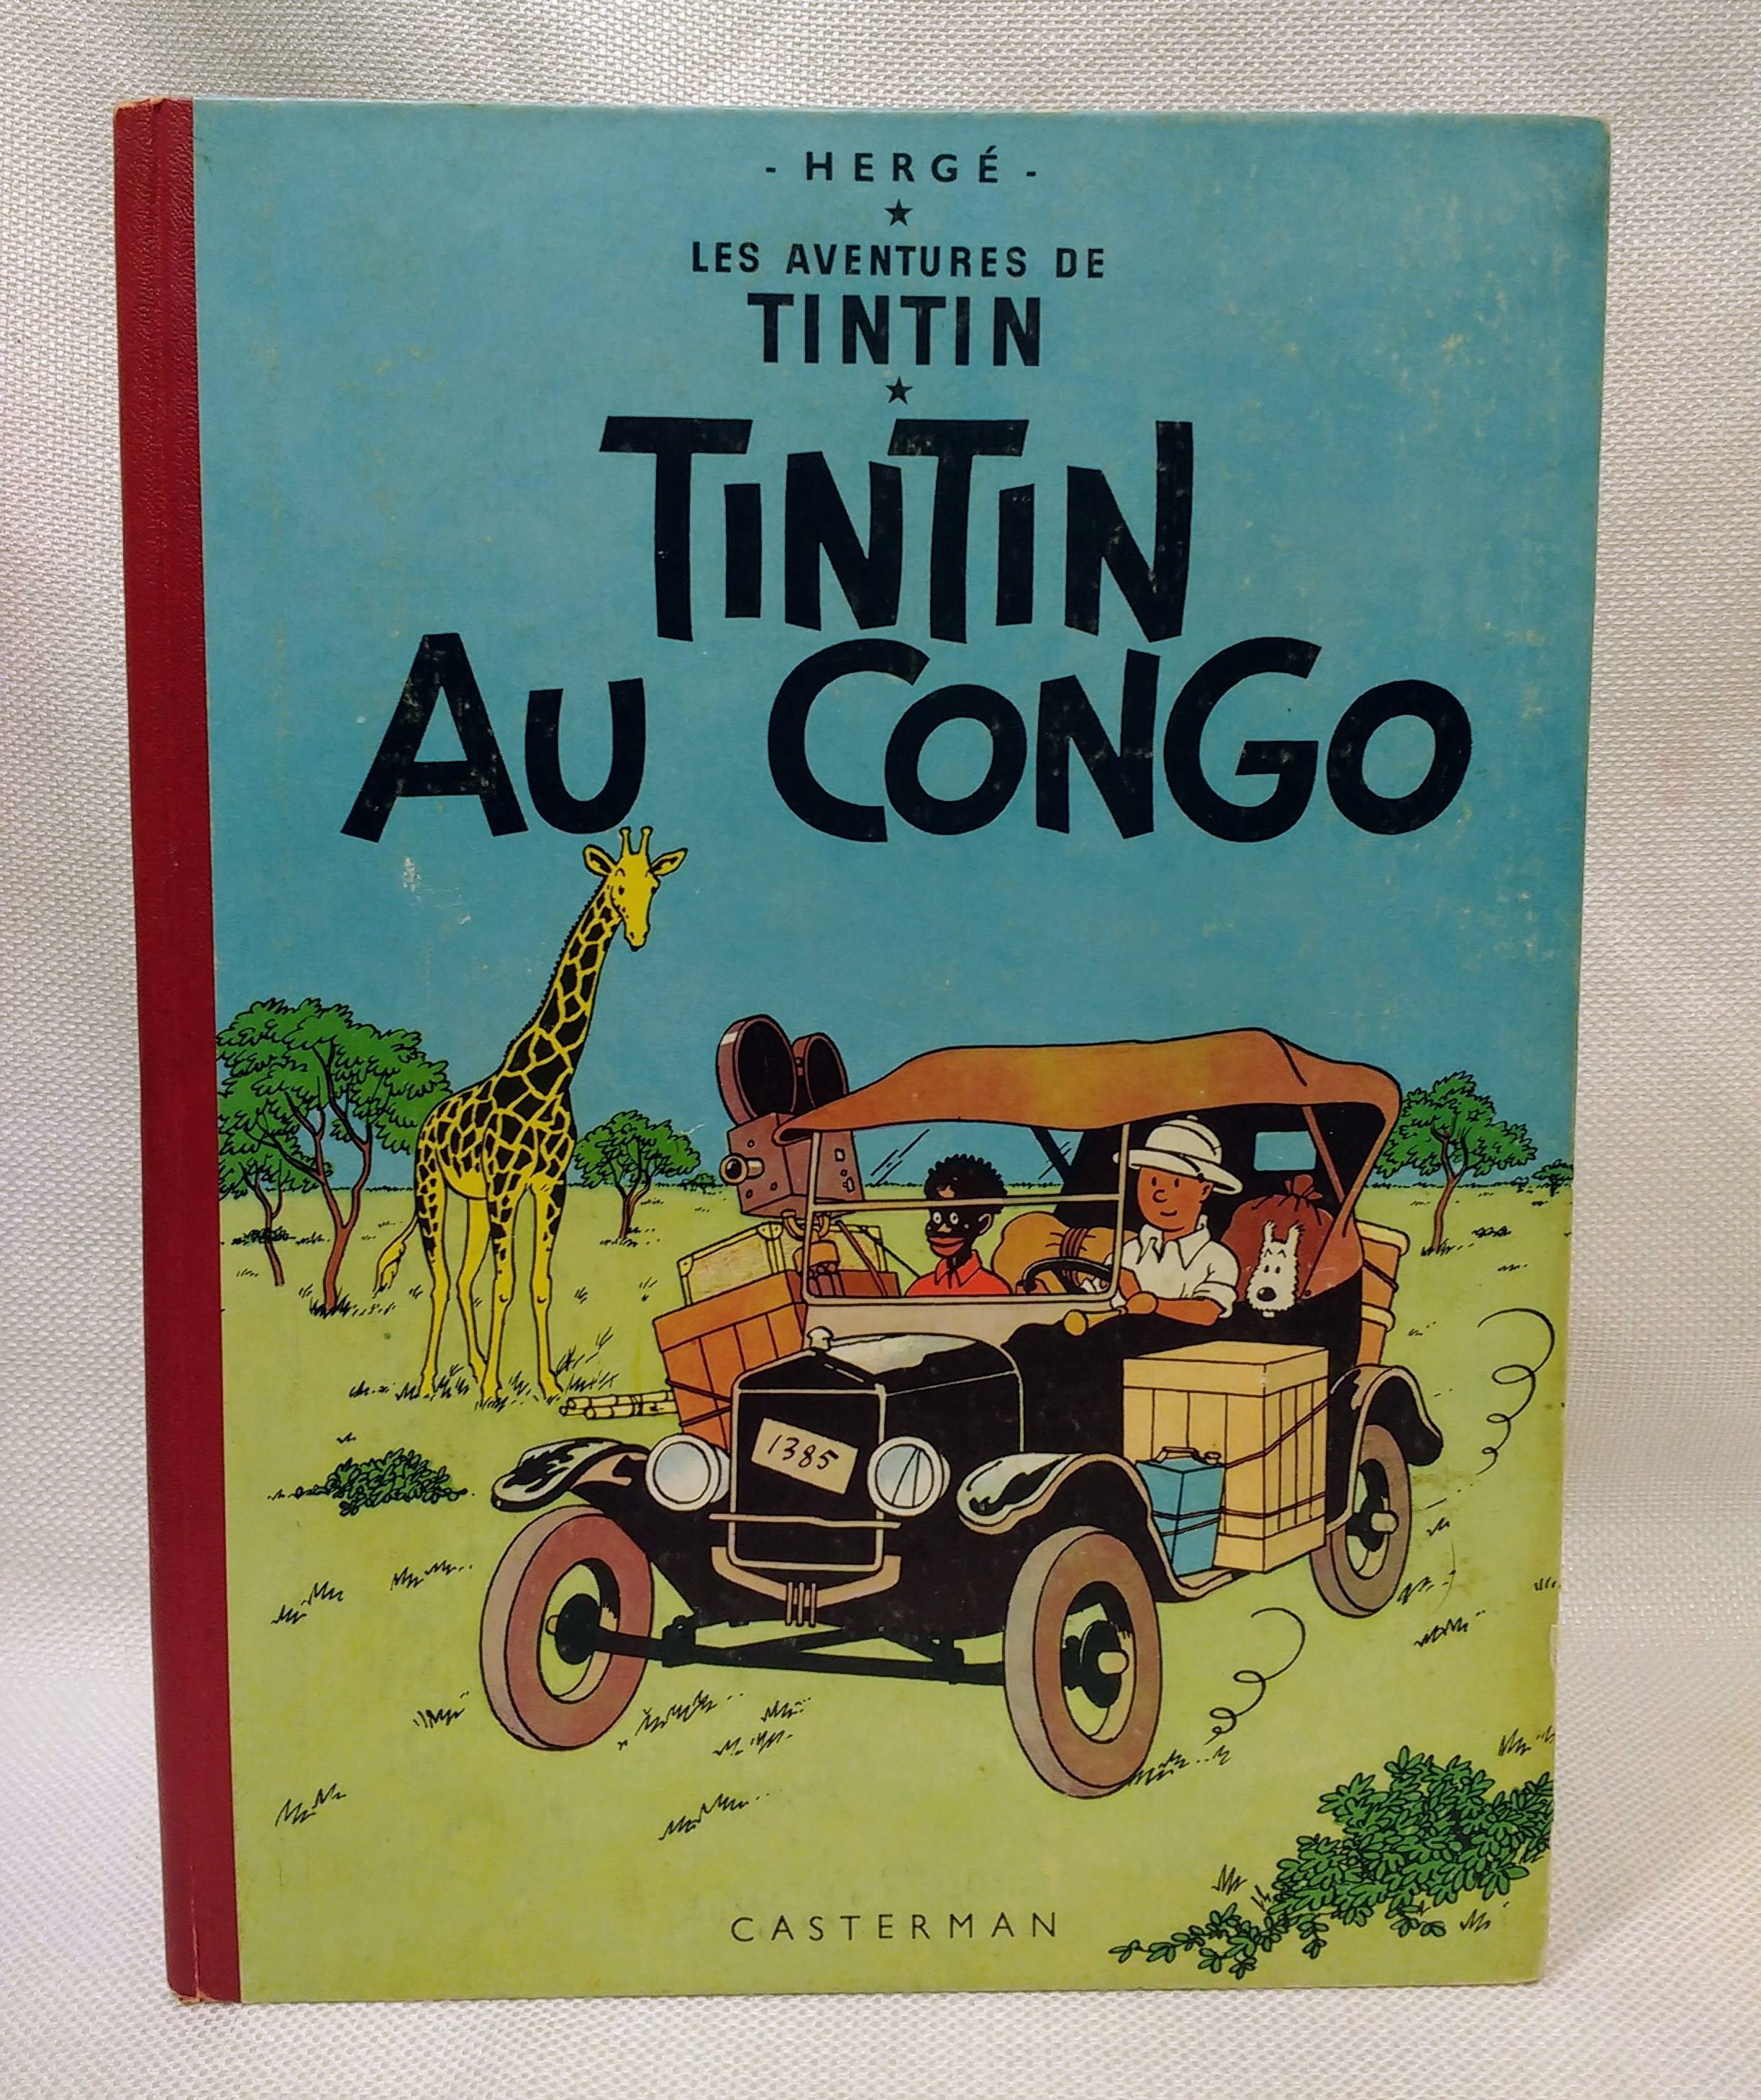 Les Aventures de Tintin : Tintin au Congo (Tintin in the Congo) (French Edition), Herge